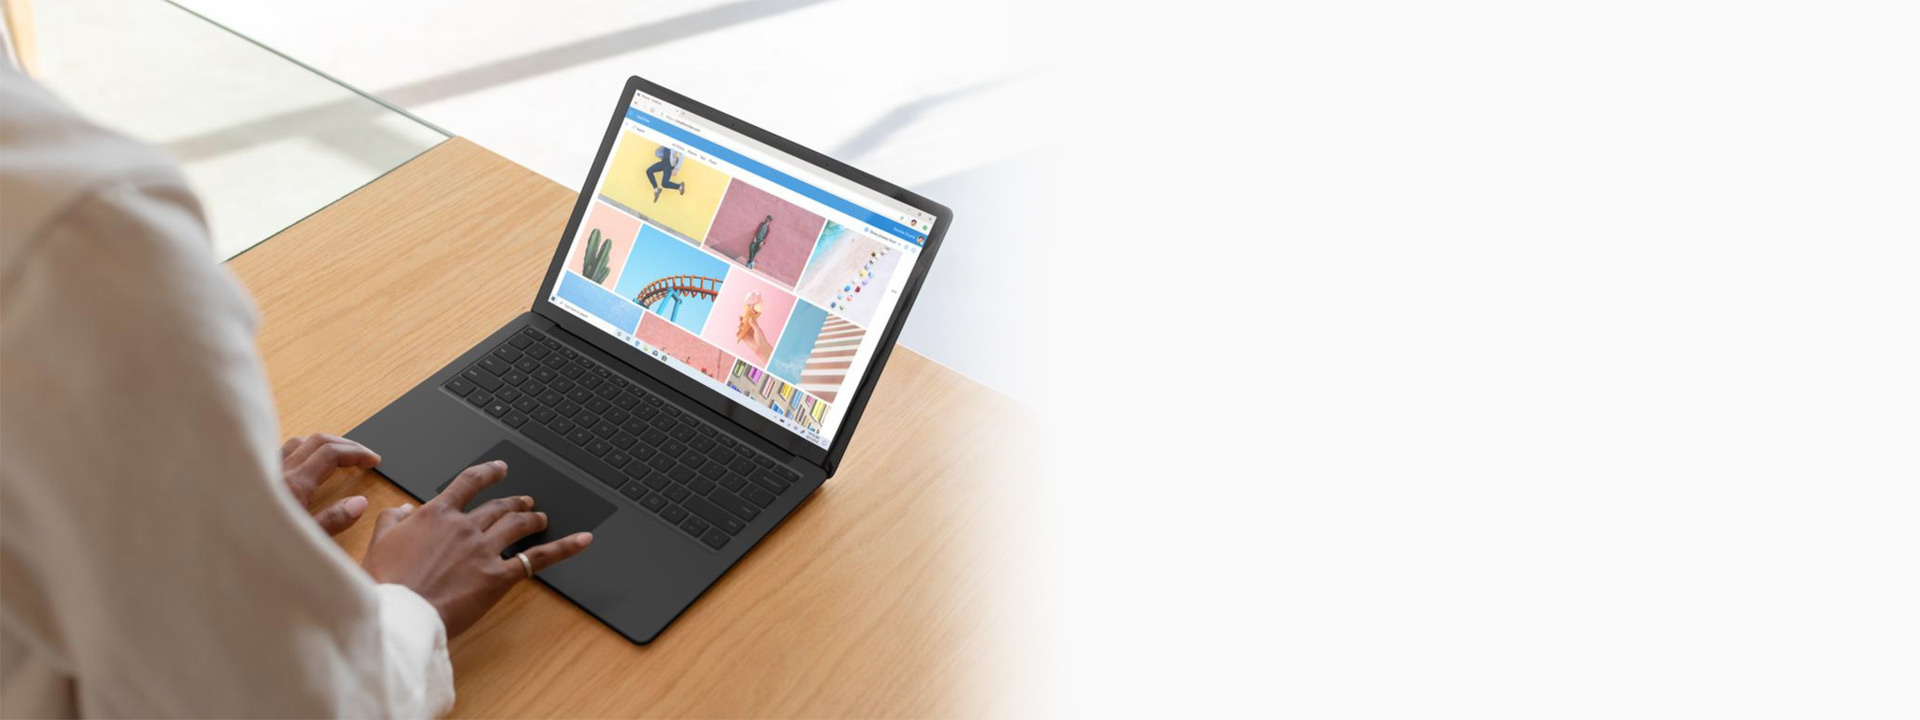 黑色 Surface Laptop 3